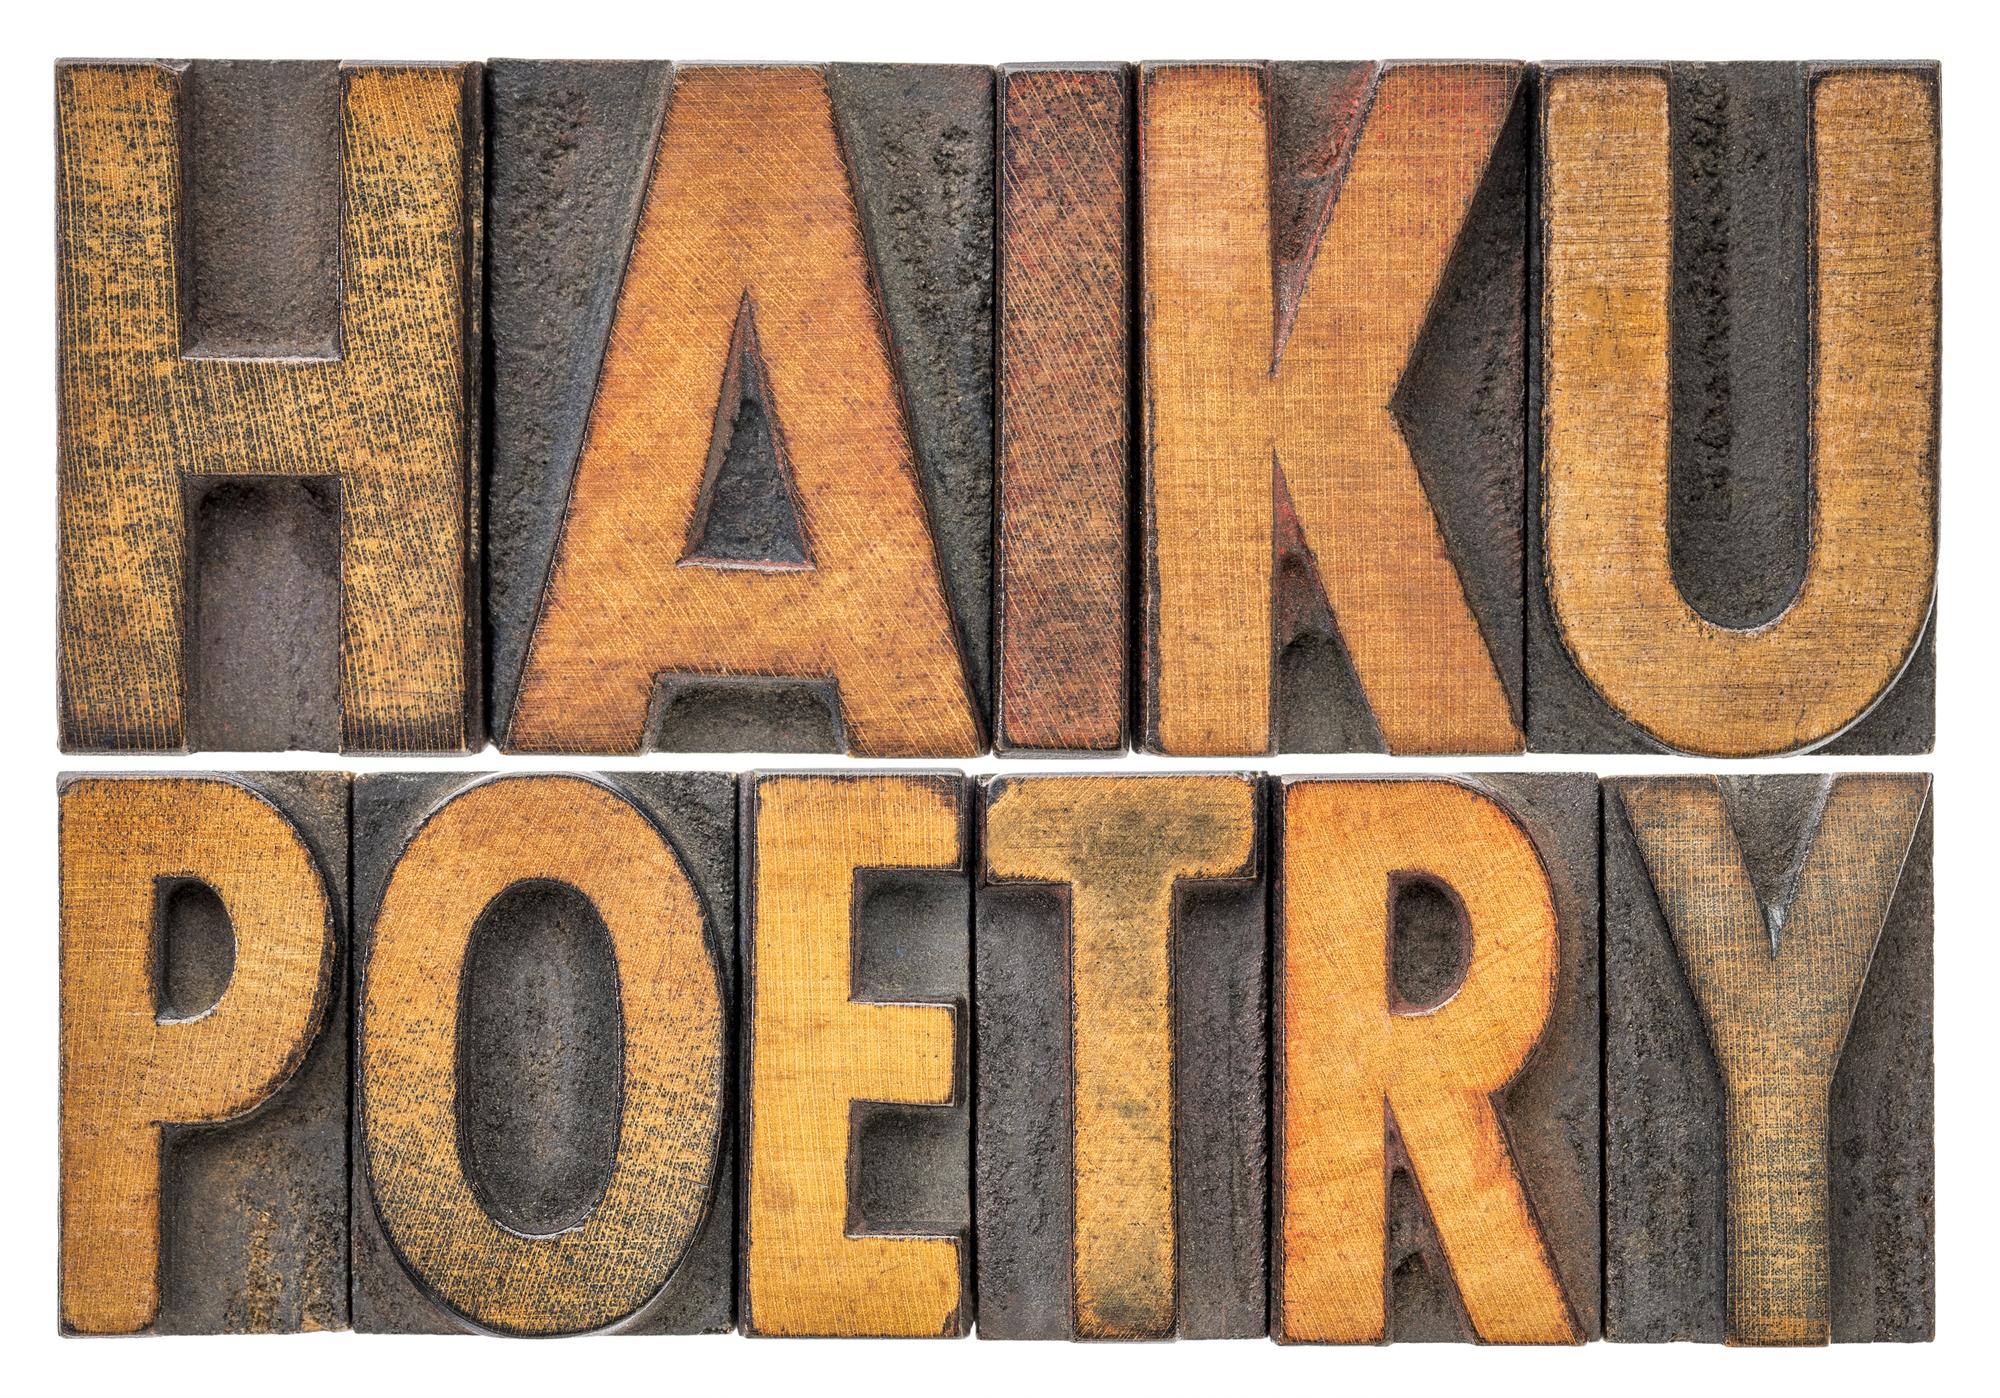 JANUARY HAIKU CHALLENGE LEADS TO FEBRUARY SLAM